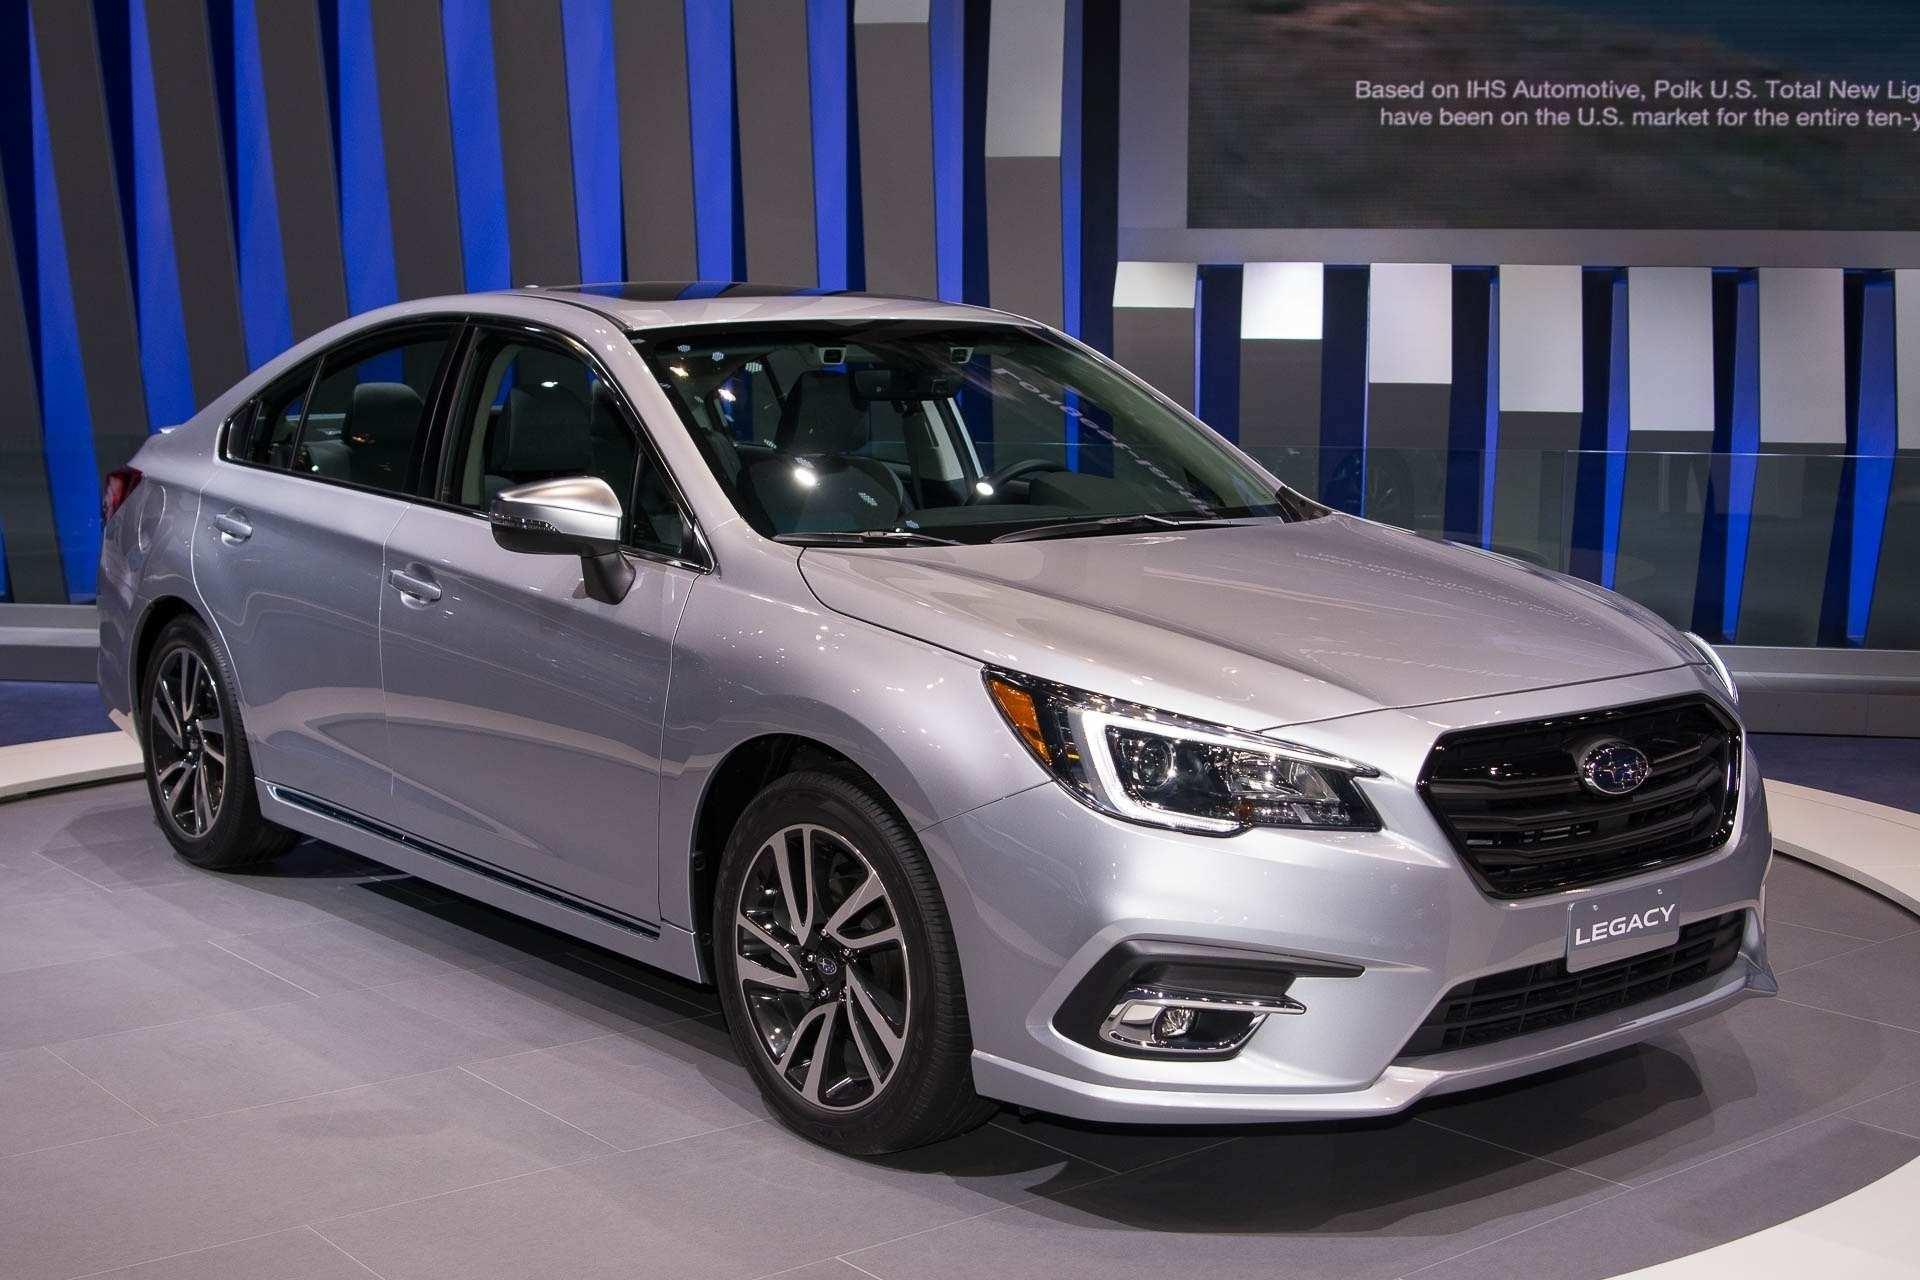 88 Great 2019 Subaru Legacy Gt Style with 2019 Subaru Legacy Gt